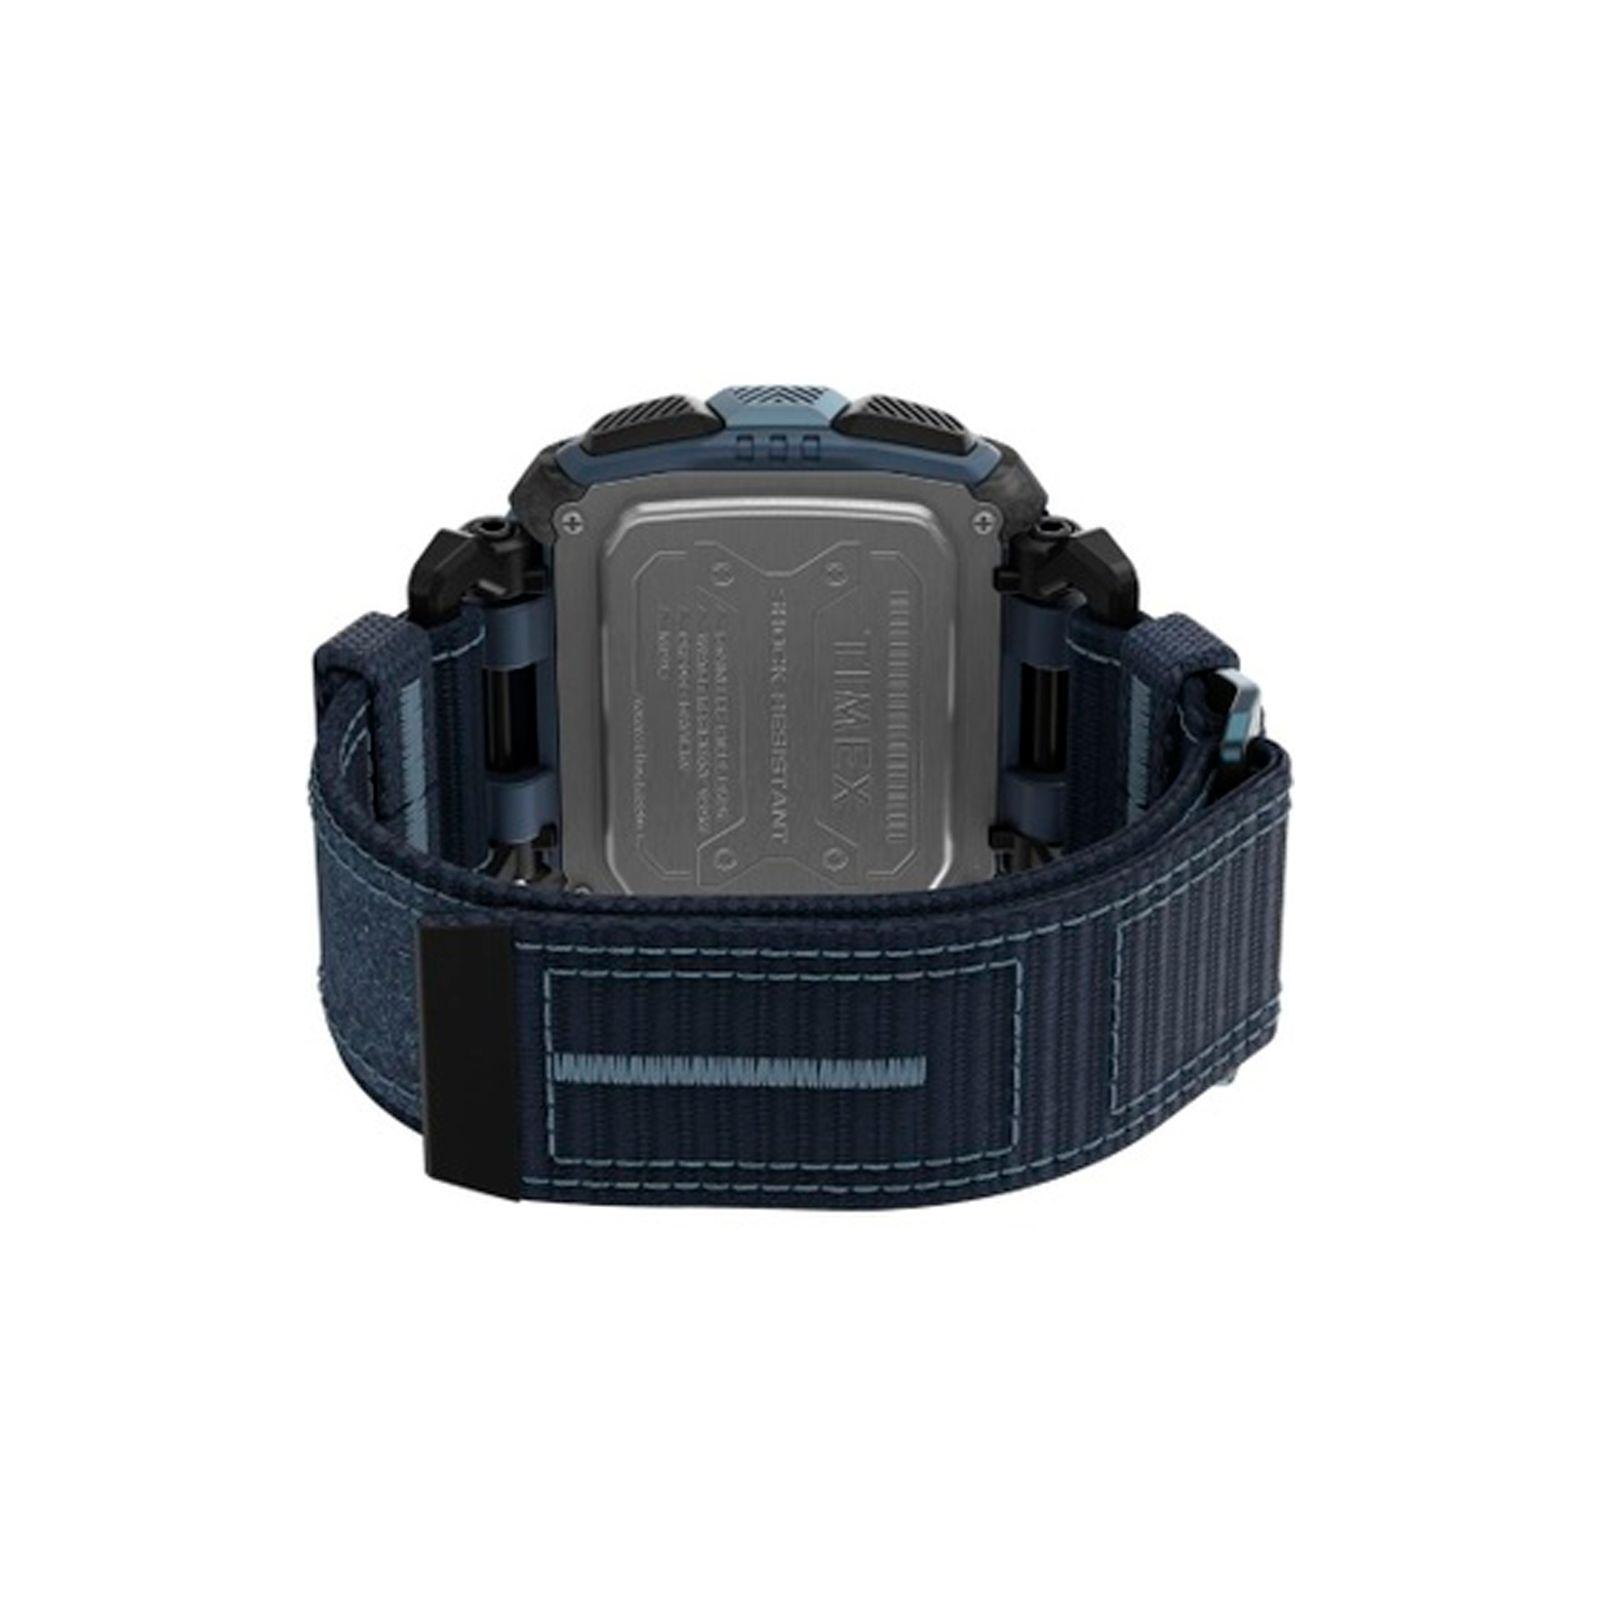 ساعت مچی دیجیتال مردانه تایمکس مدل TW5M28700 -  - 3